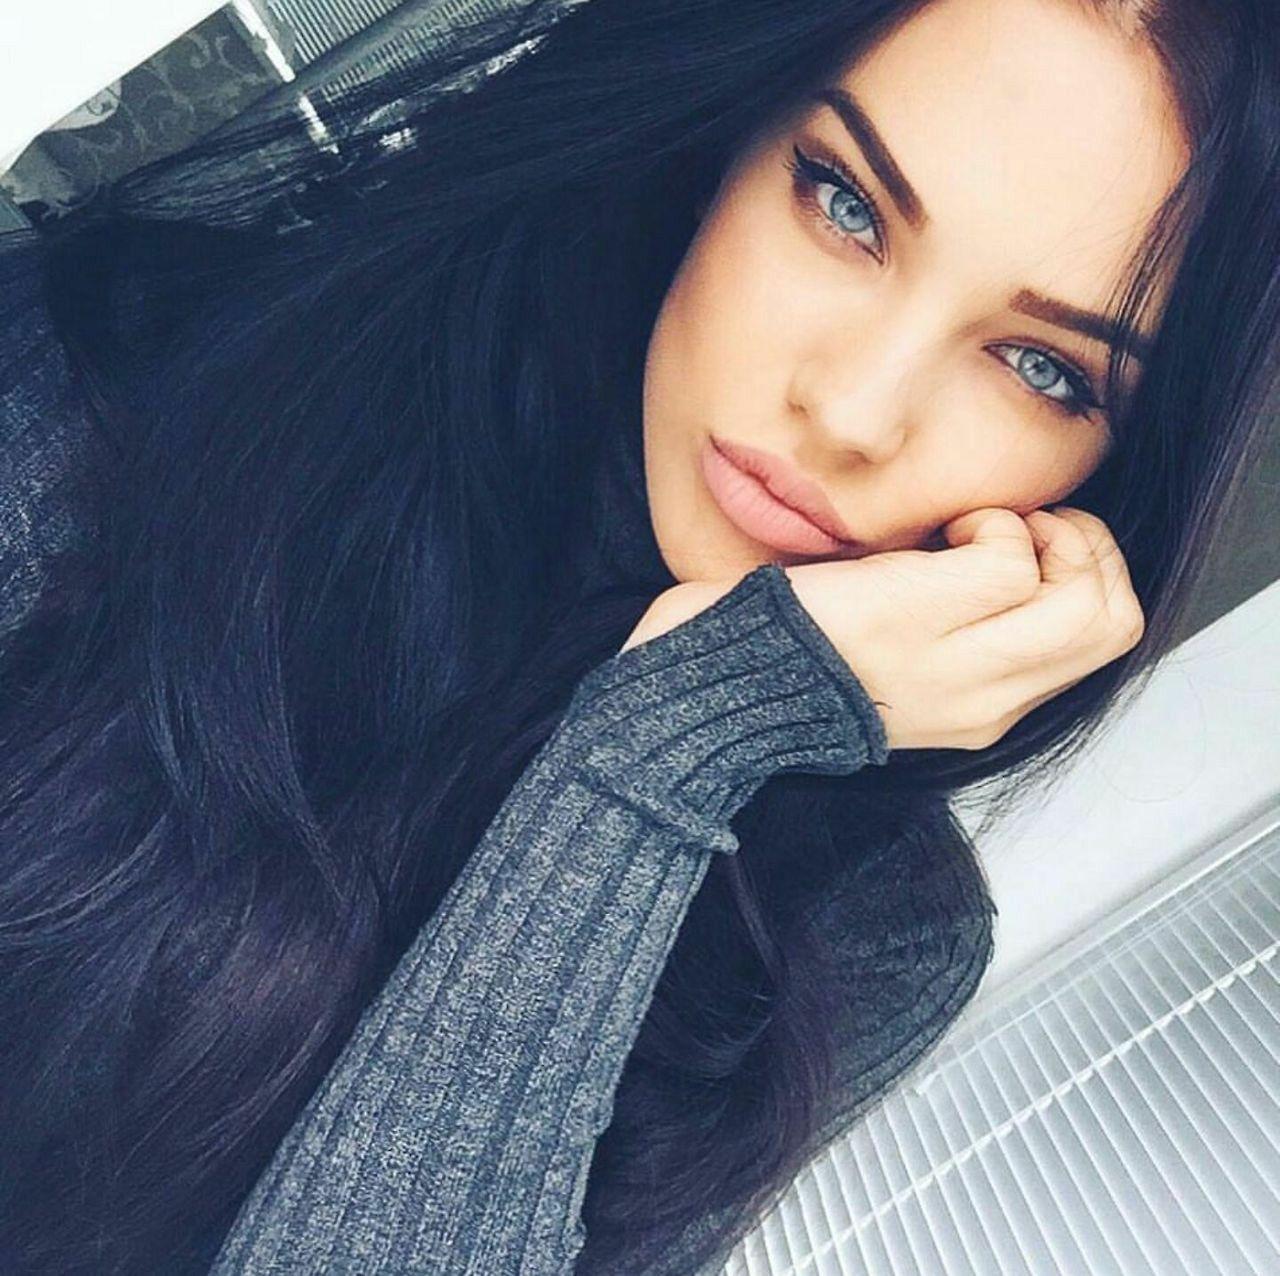 Pin By Lara On Eyesofbeauty Black Hair Blue Eyes Hair Beauty Long Black Hair